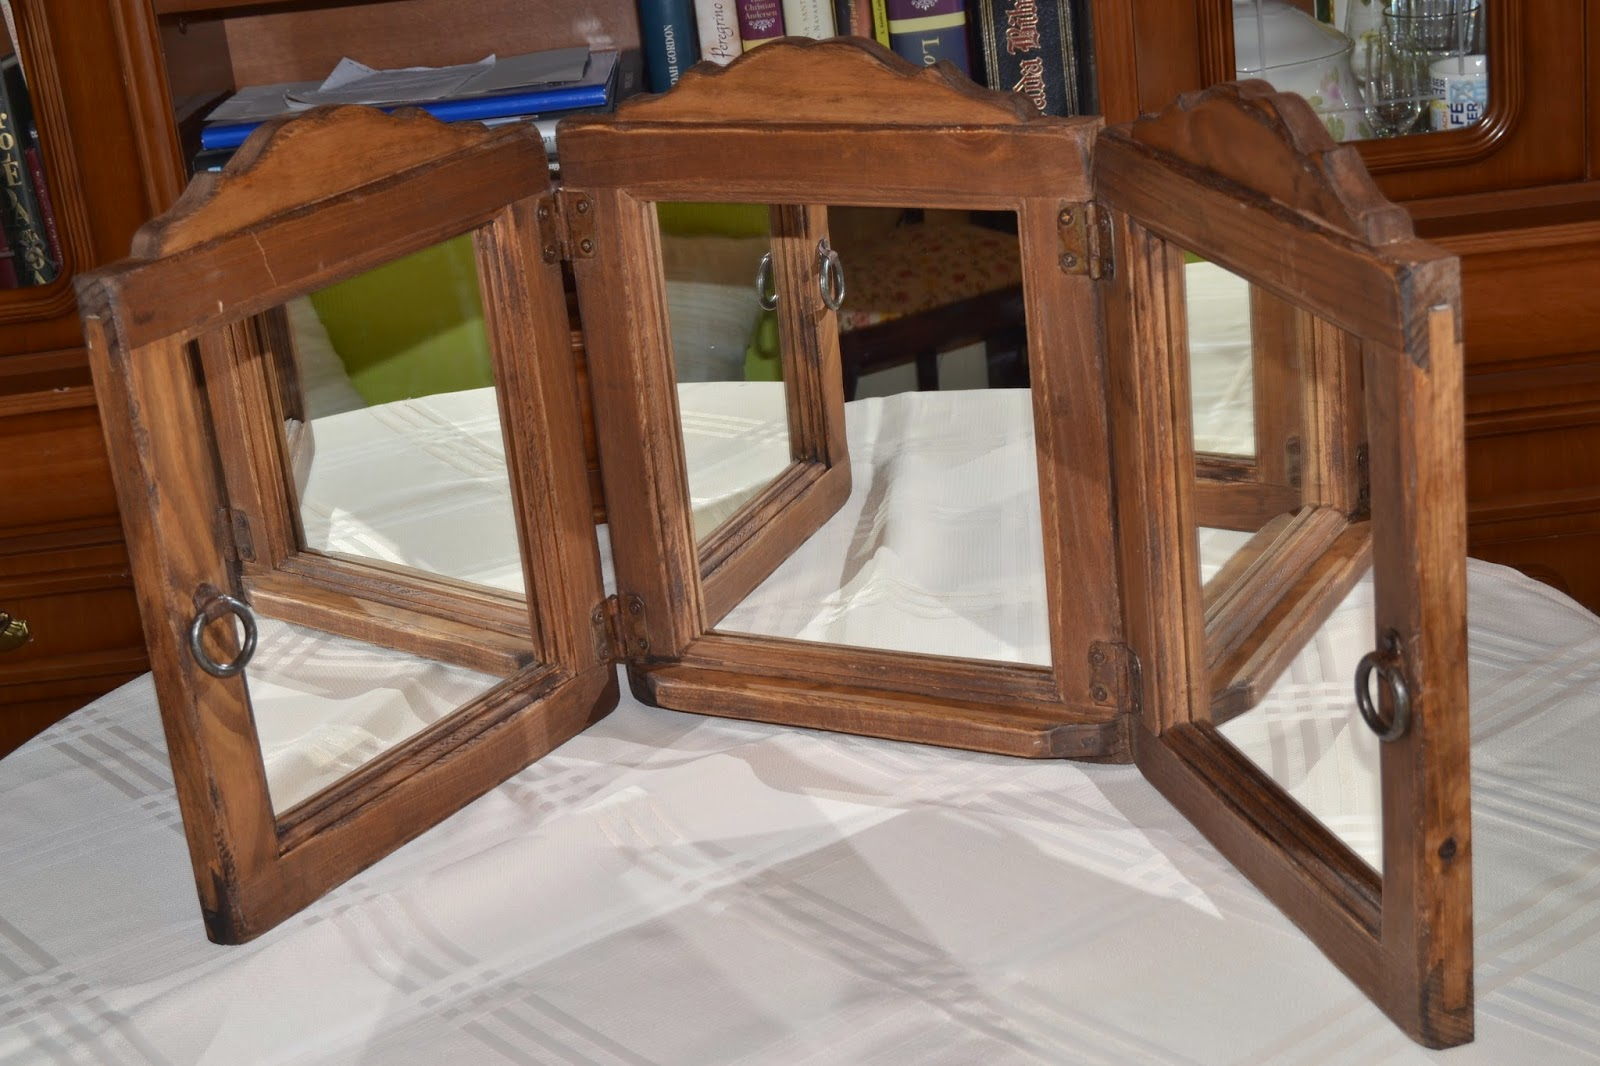 Artesan a r stica en madera marcos de madera for Espejos de pared con marco de madera